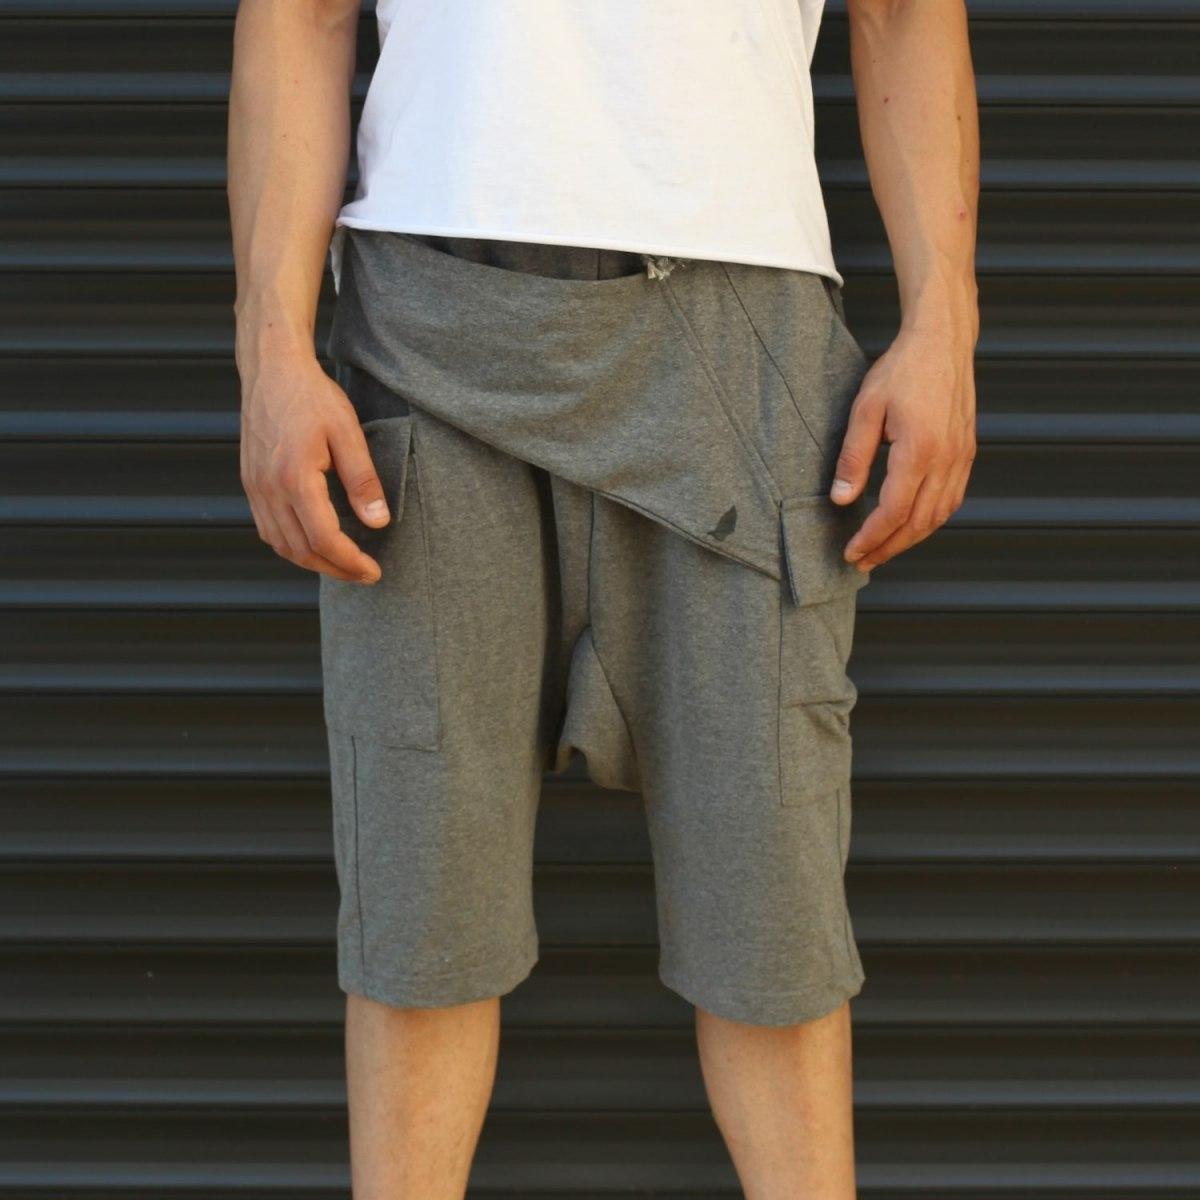 Men's Shalwar Design Fleece Sport Shorts With Side Pockets Gray Mv Premium Brand - 2